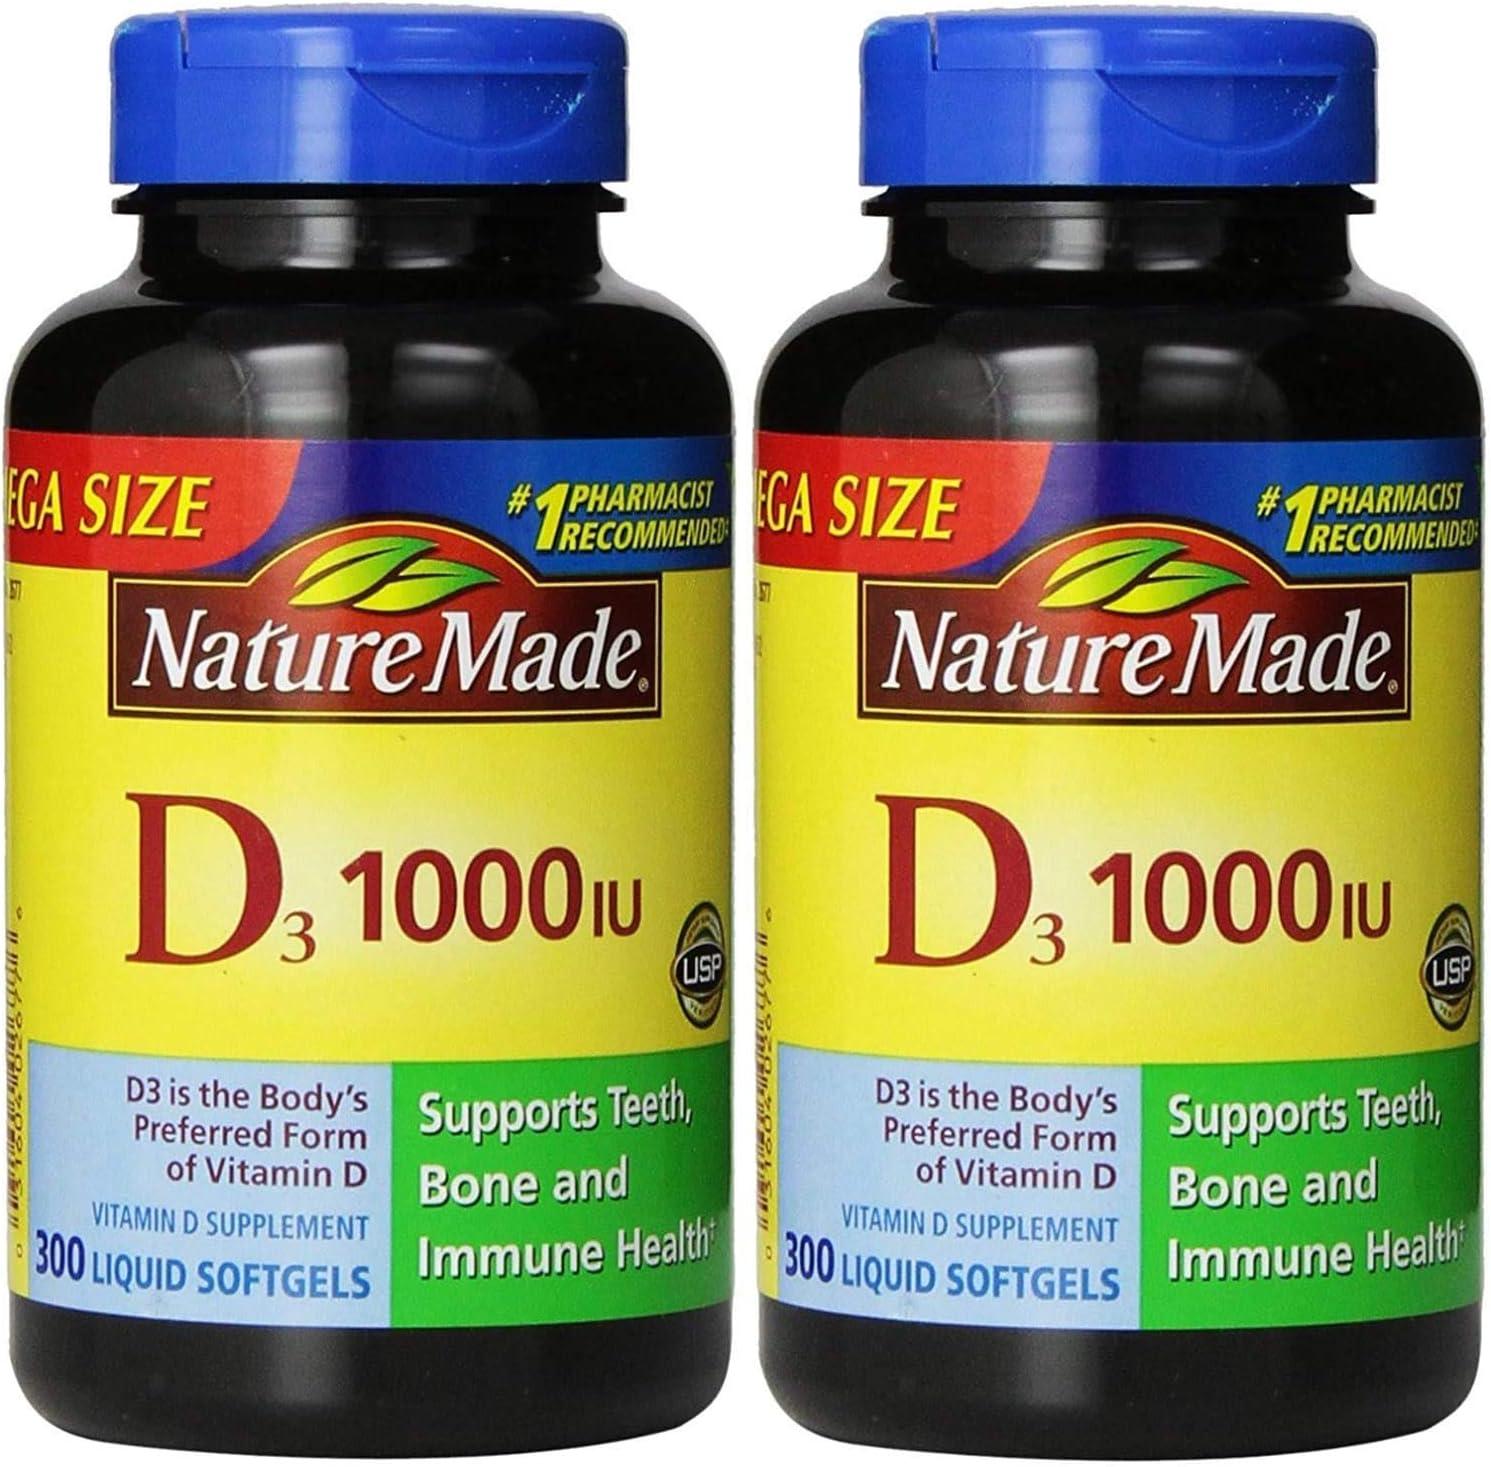 Nature Made Vitamin D3 Tablets, 1000 IU, 300 ct Each. ( 2pk - 600 Softgels )